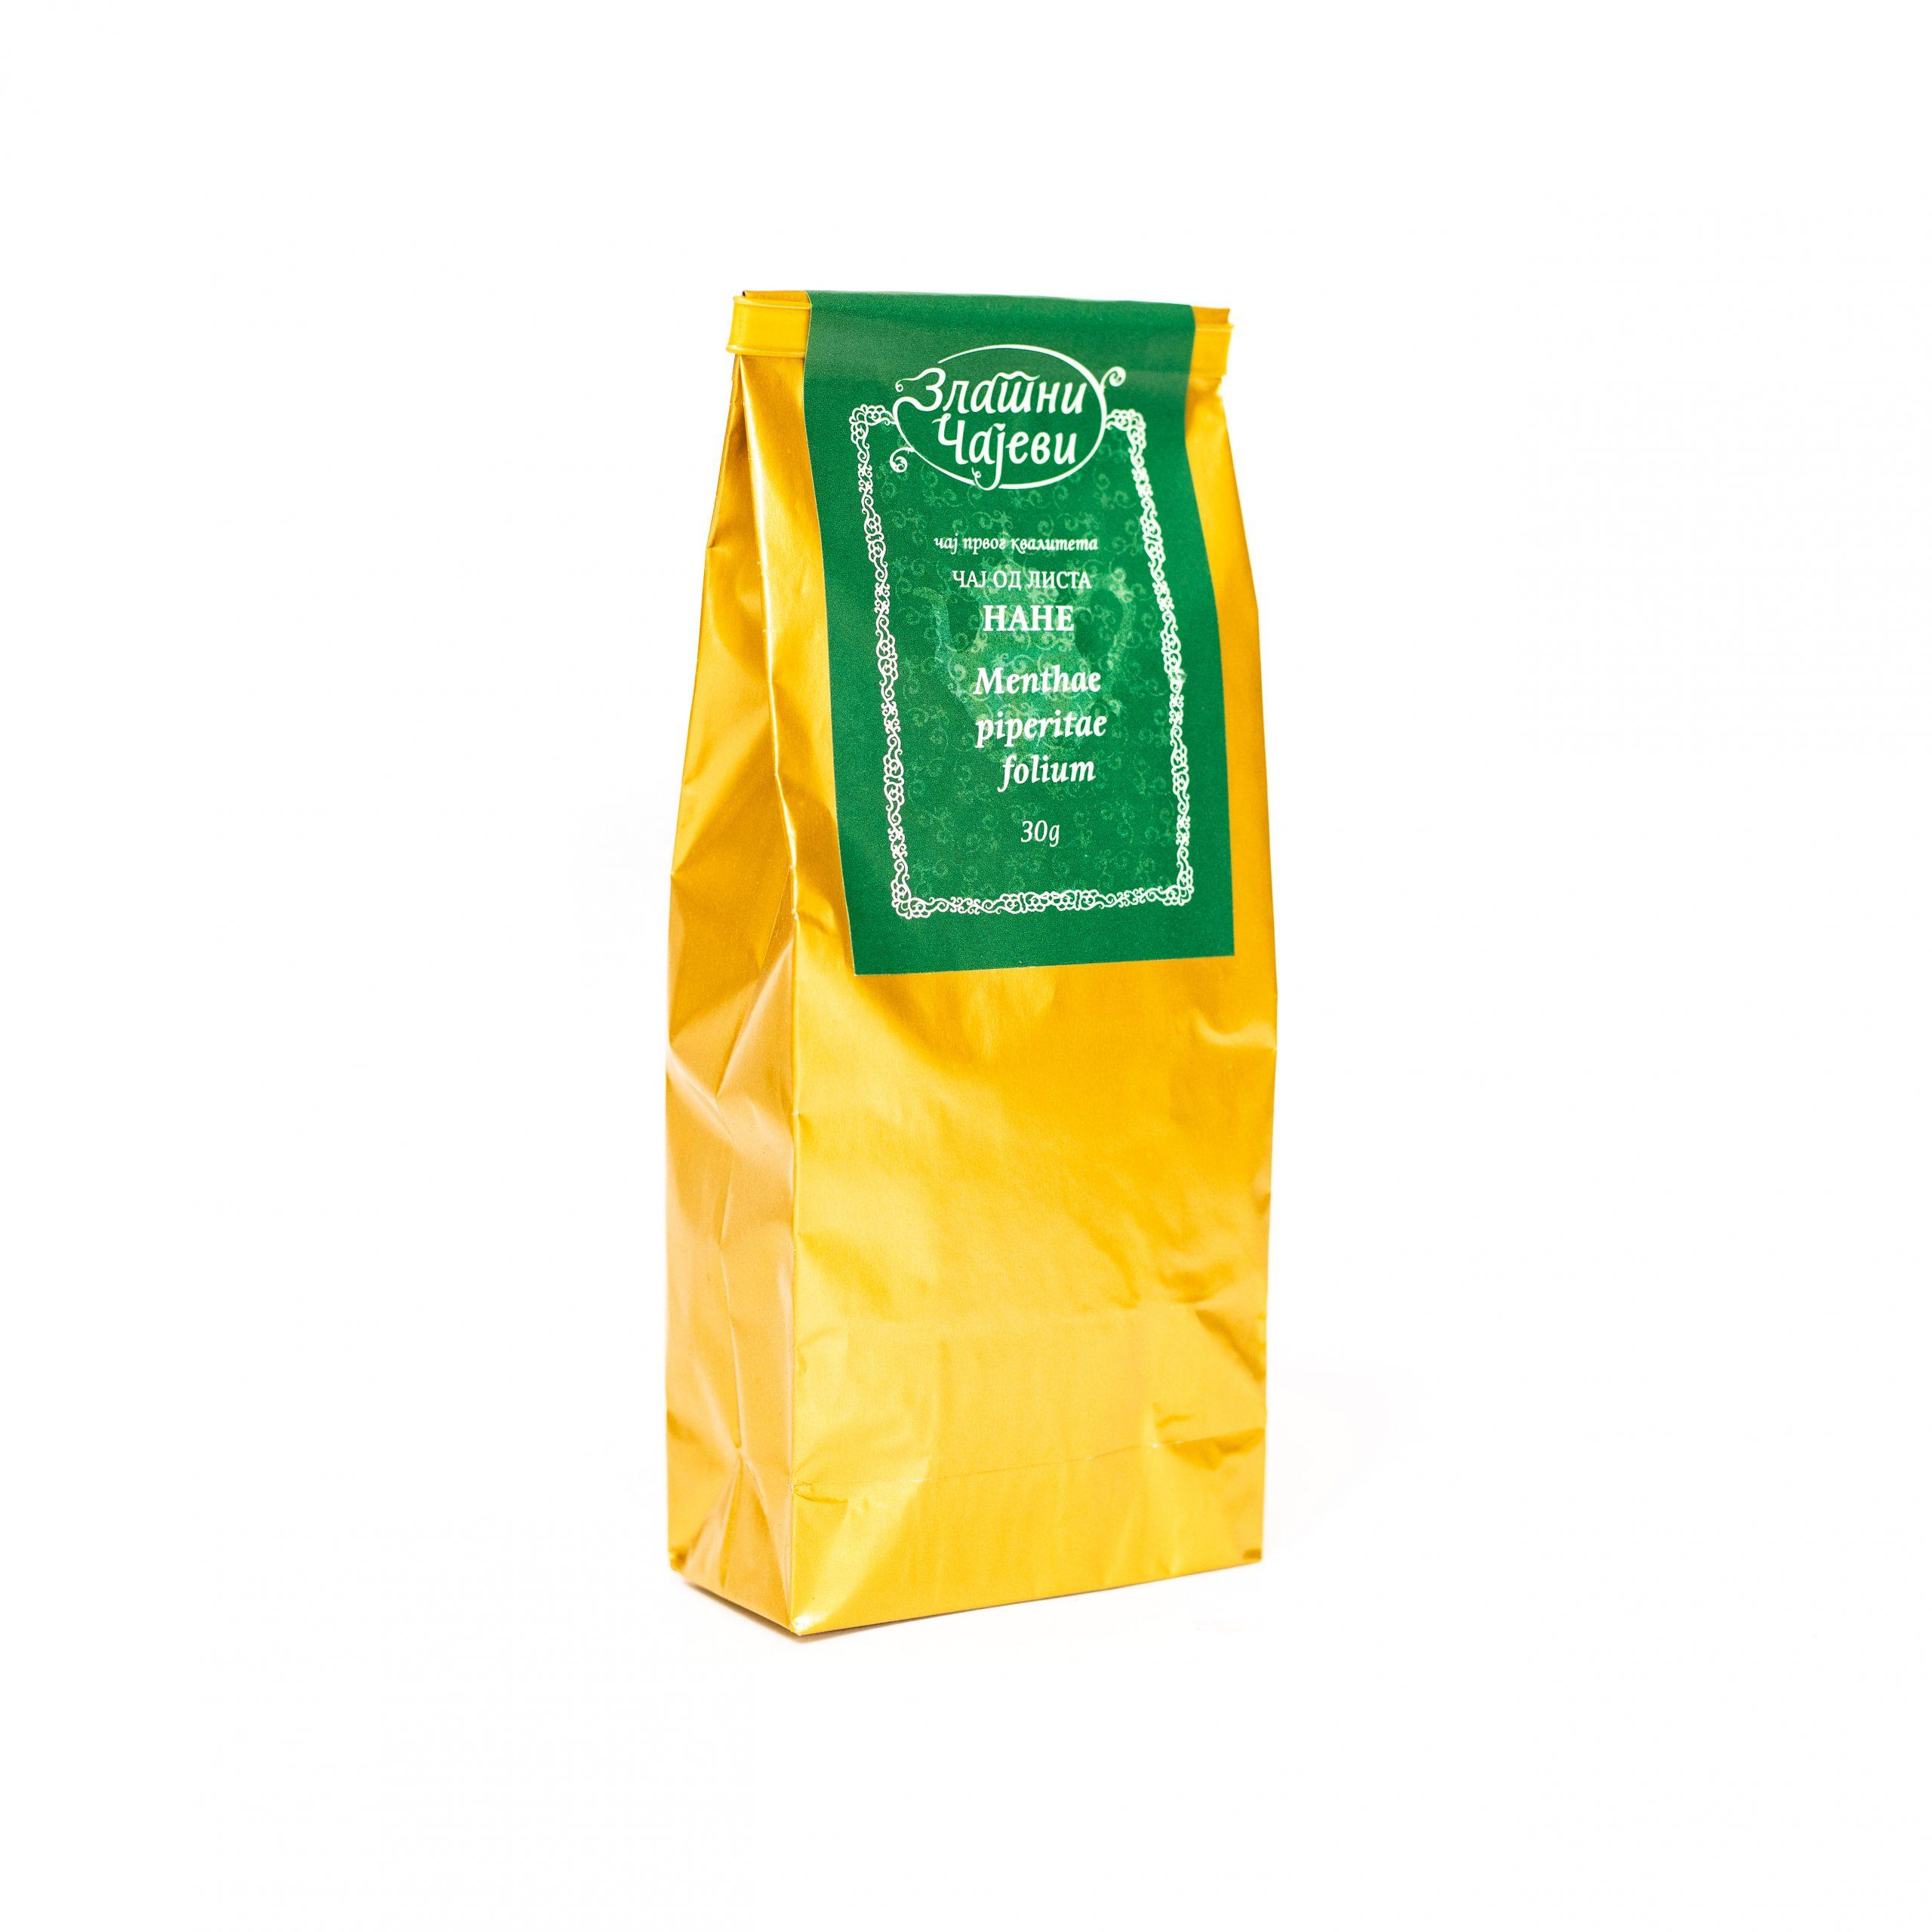 Čaj od lista nane Zlatni Čajevi 30g